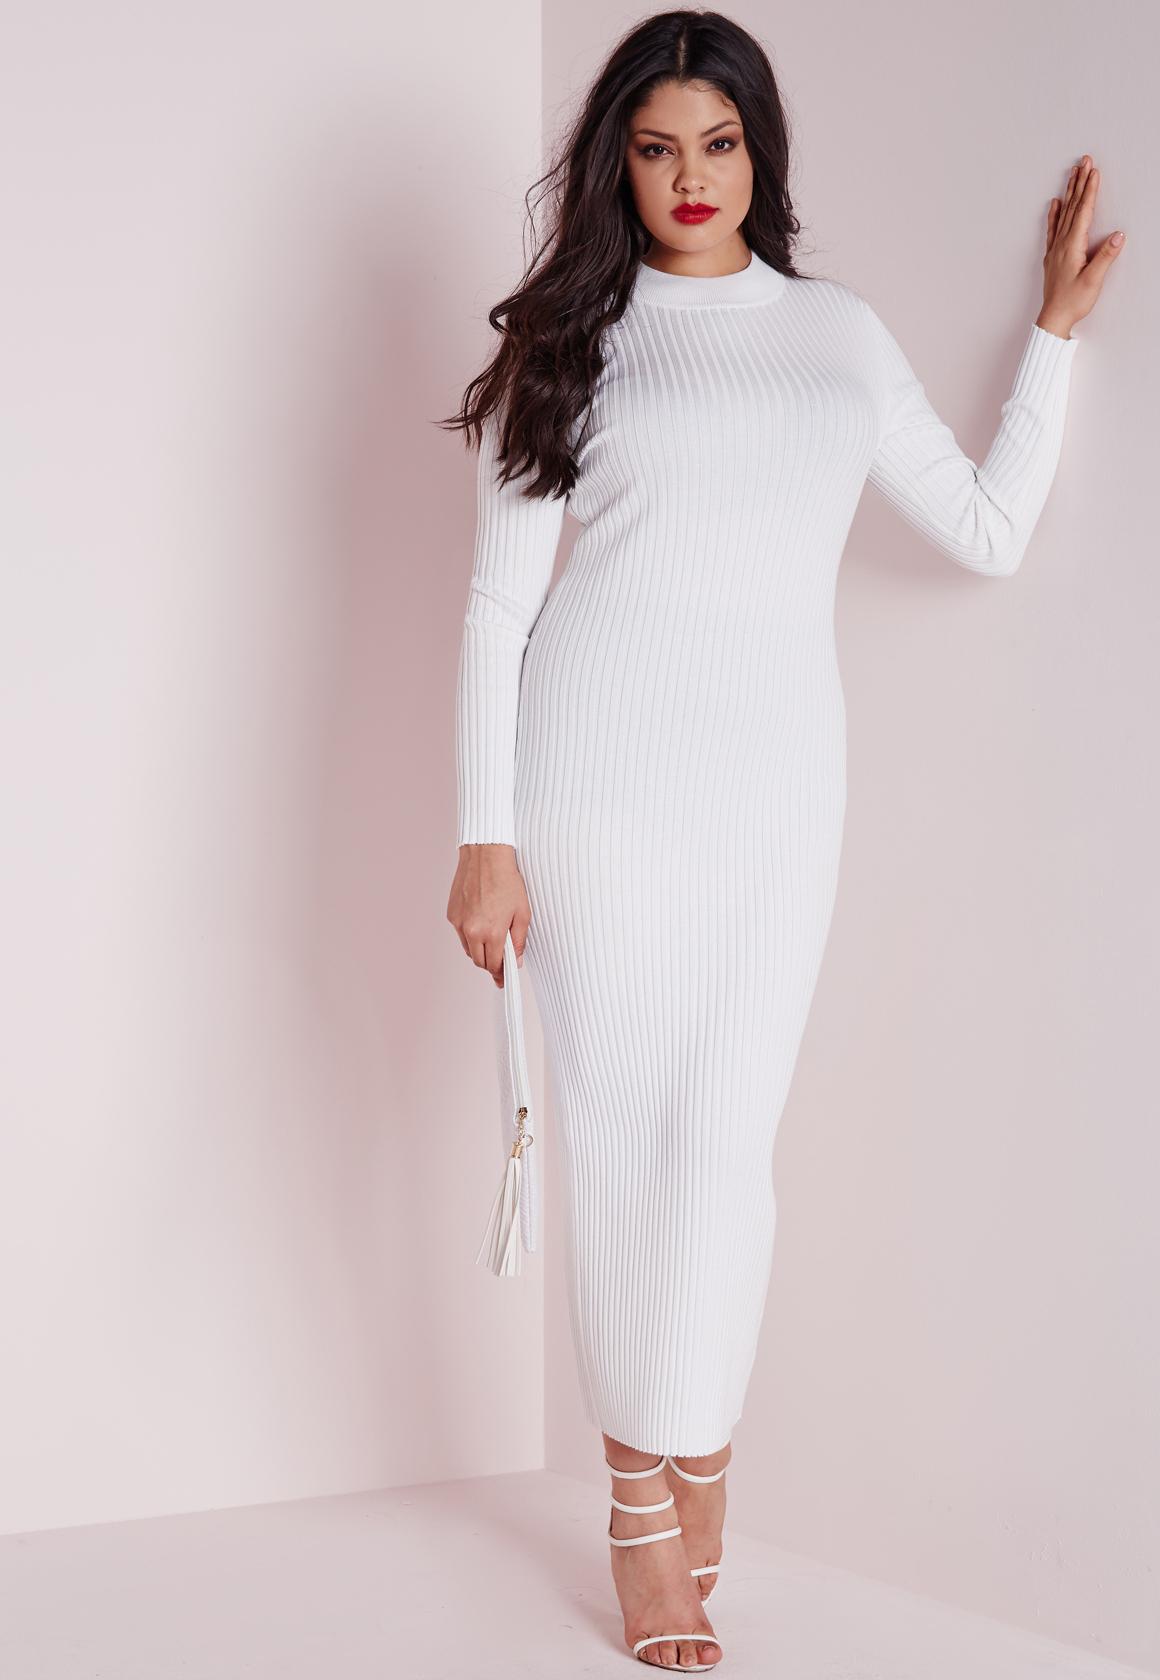 Plus Size Maxi Knitted Rib Dress White